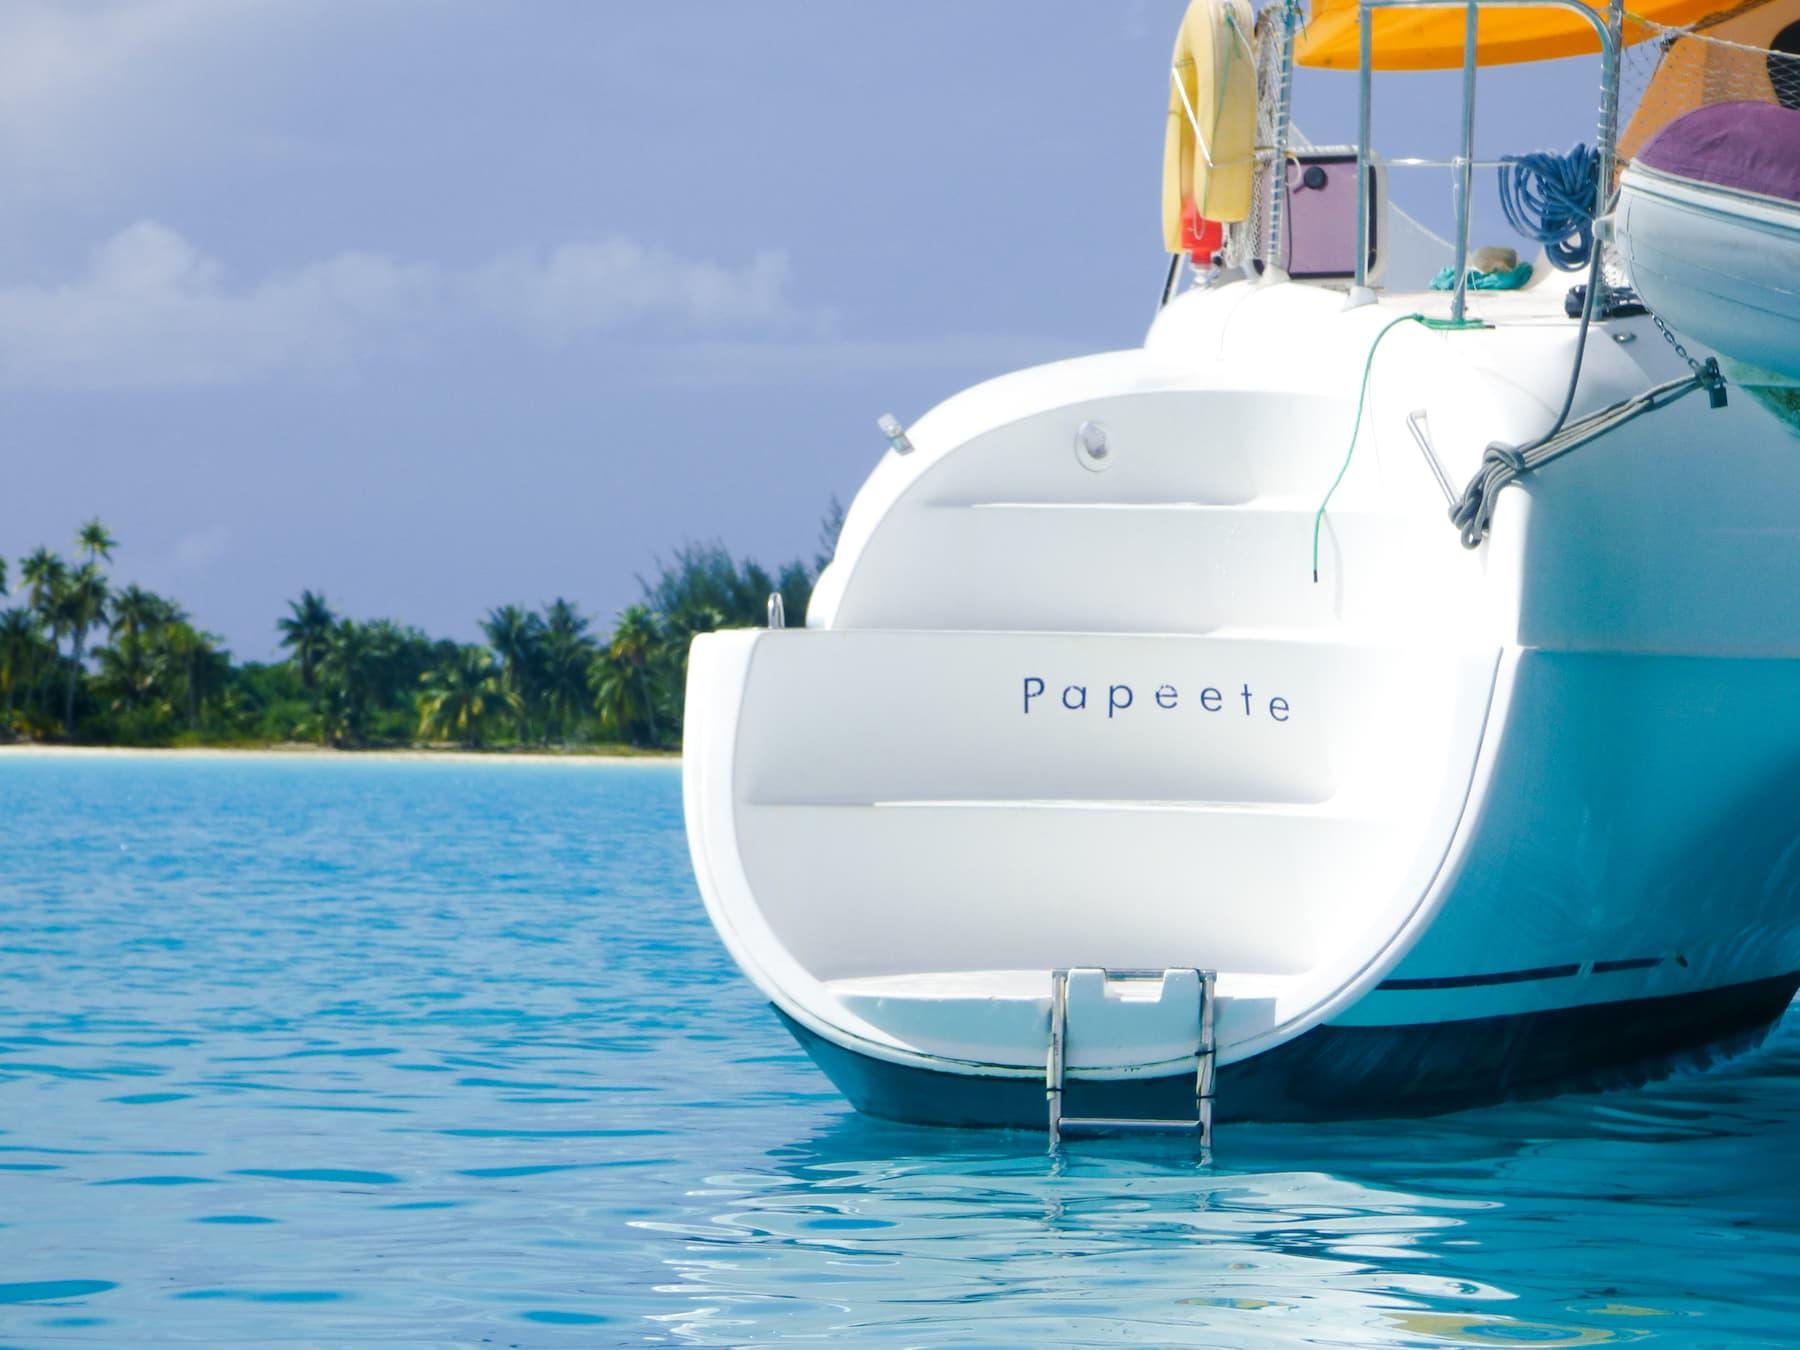 https://tahititourisme.com.br/wp-content/uploads/2017/08/bateau-tlc-modif-12.jpg